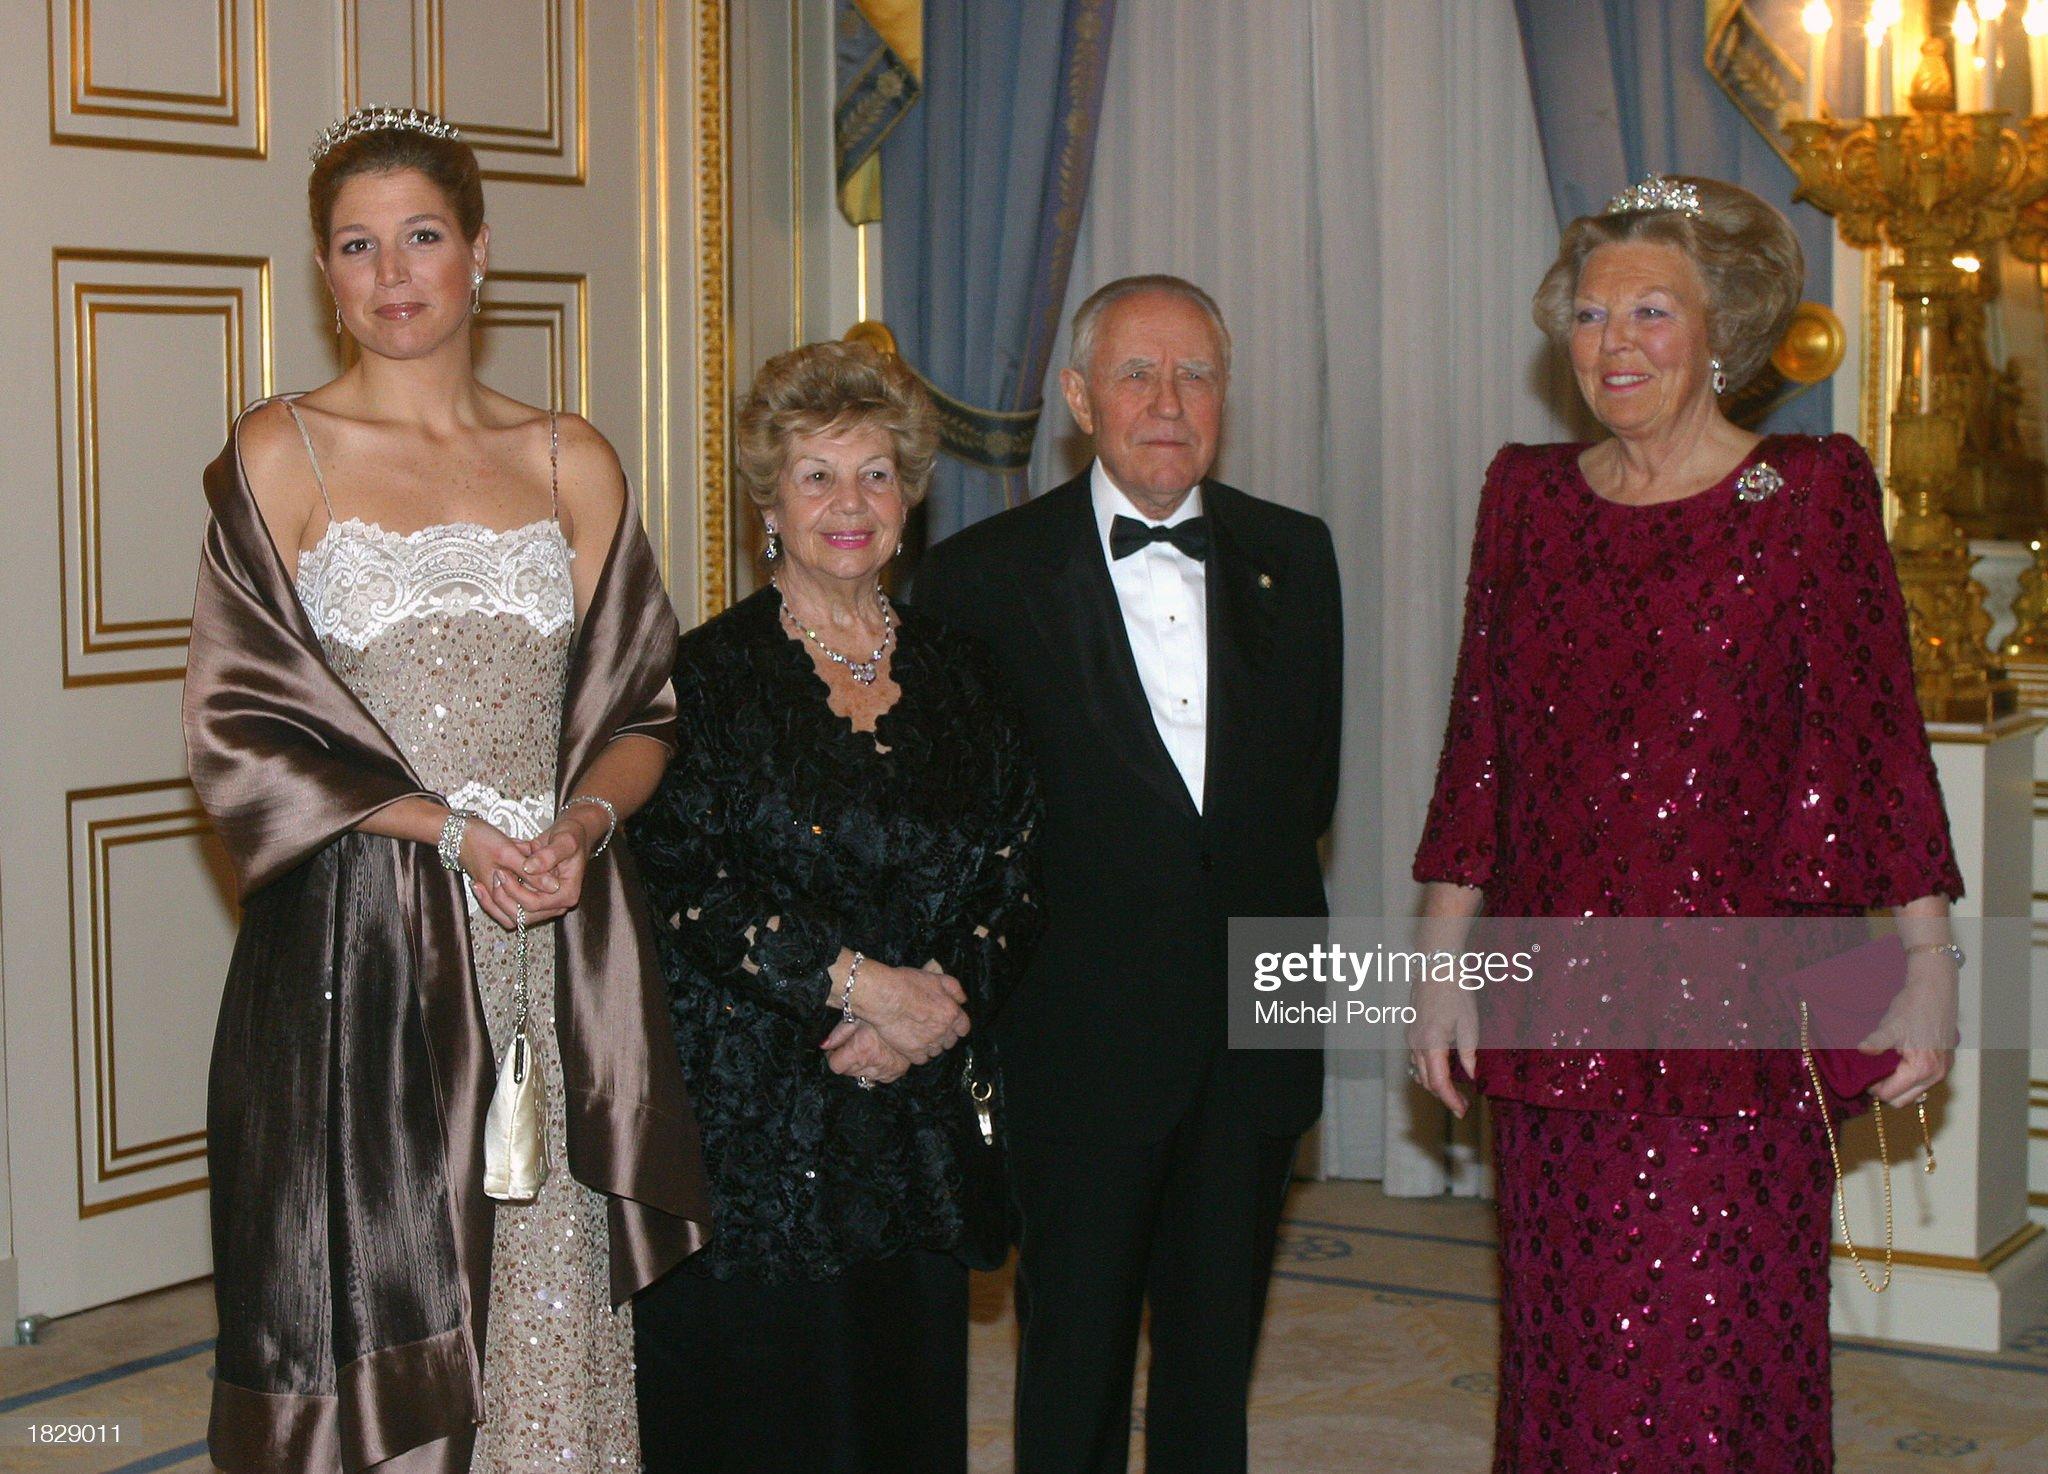 Italian President Ciampi Visits Netherlands : News Photo